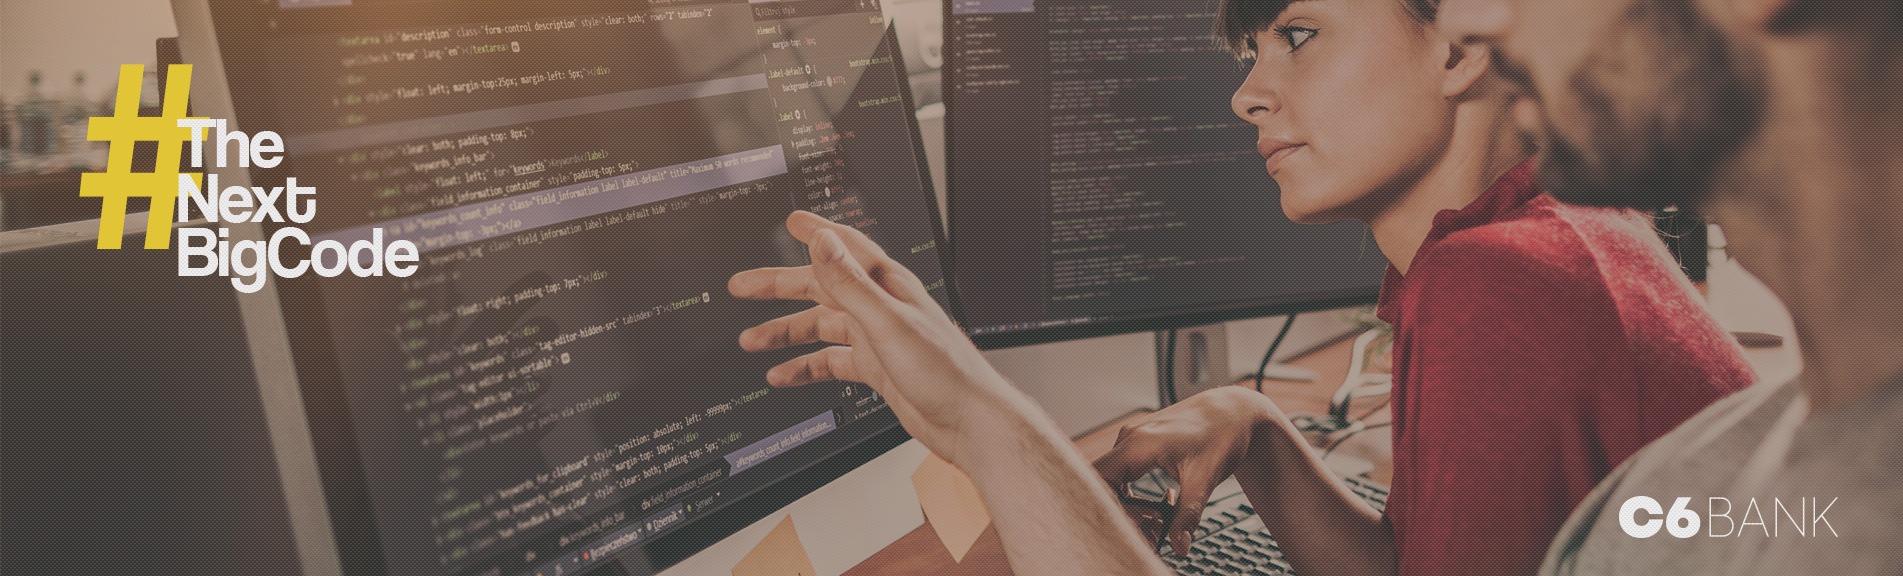 Software Engineer - Mobile